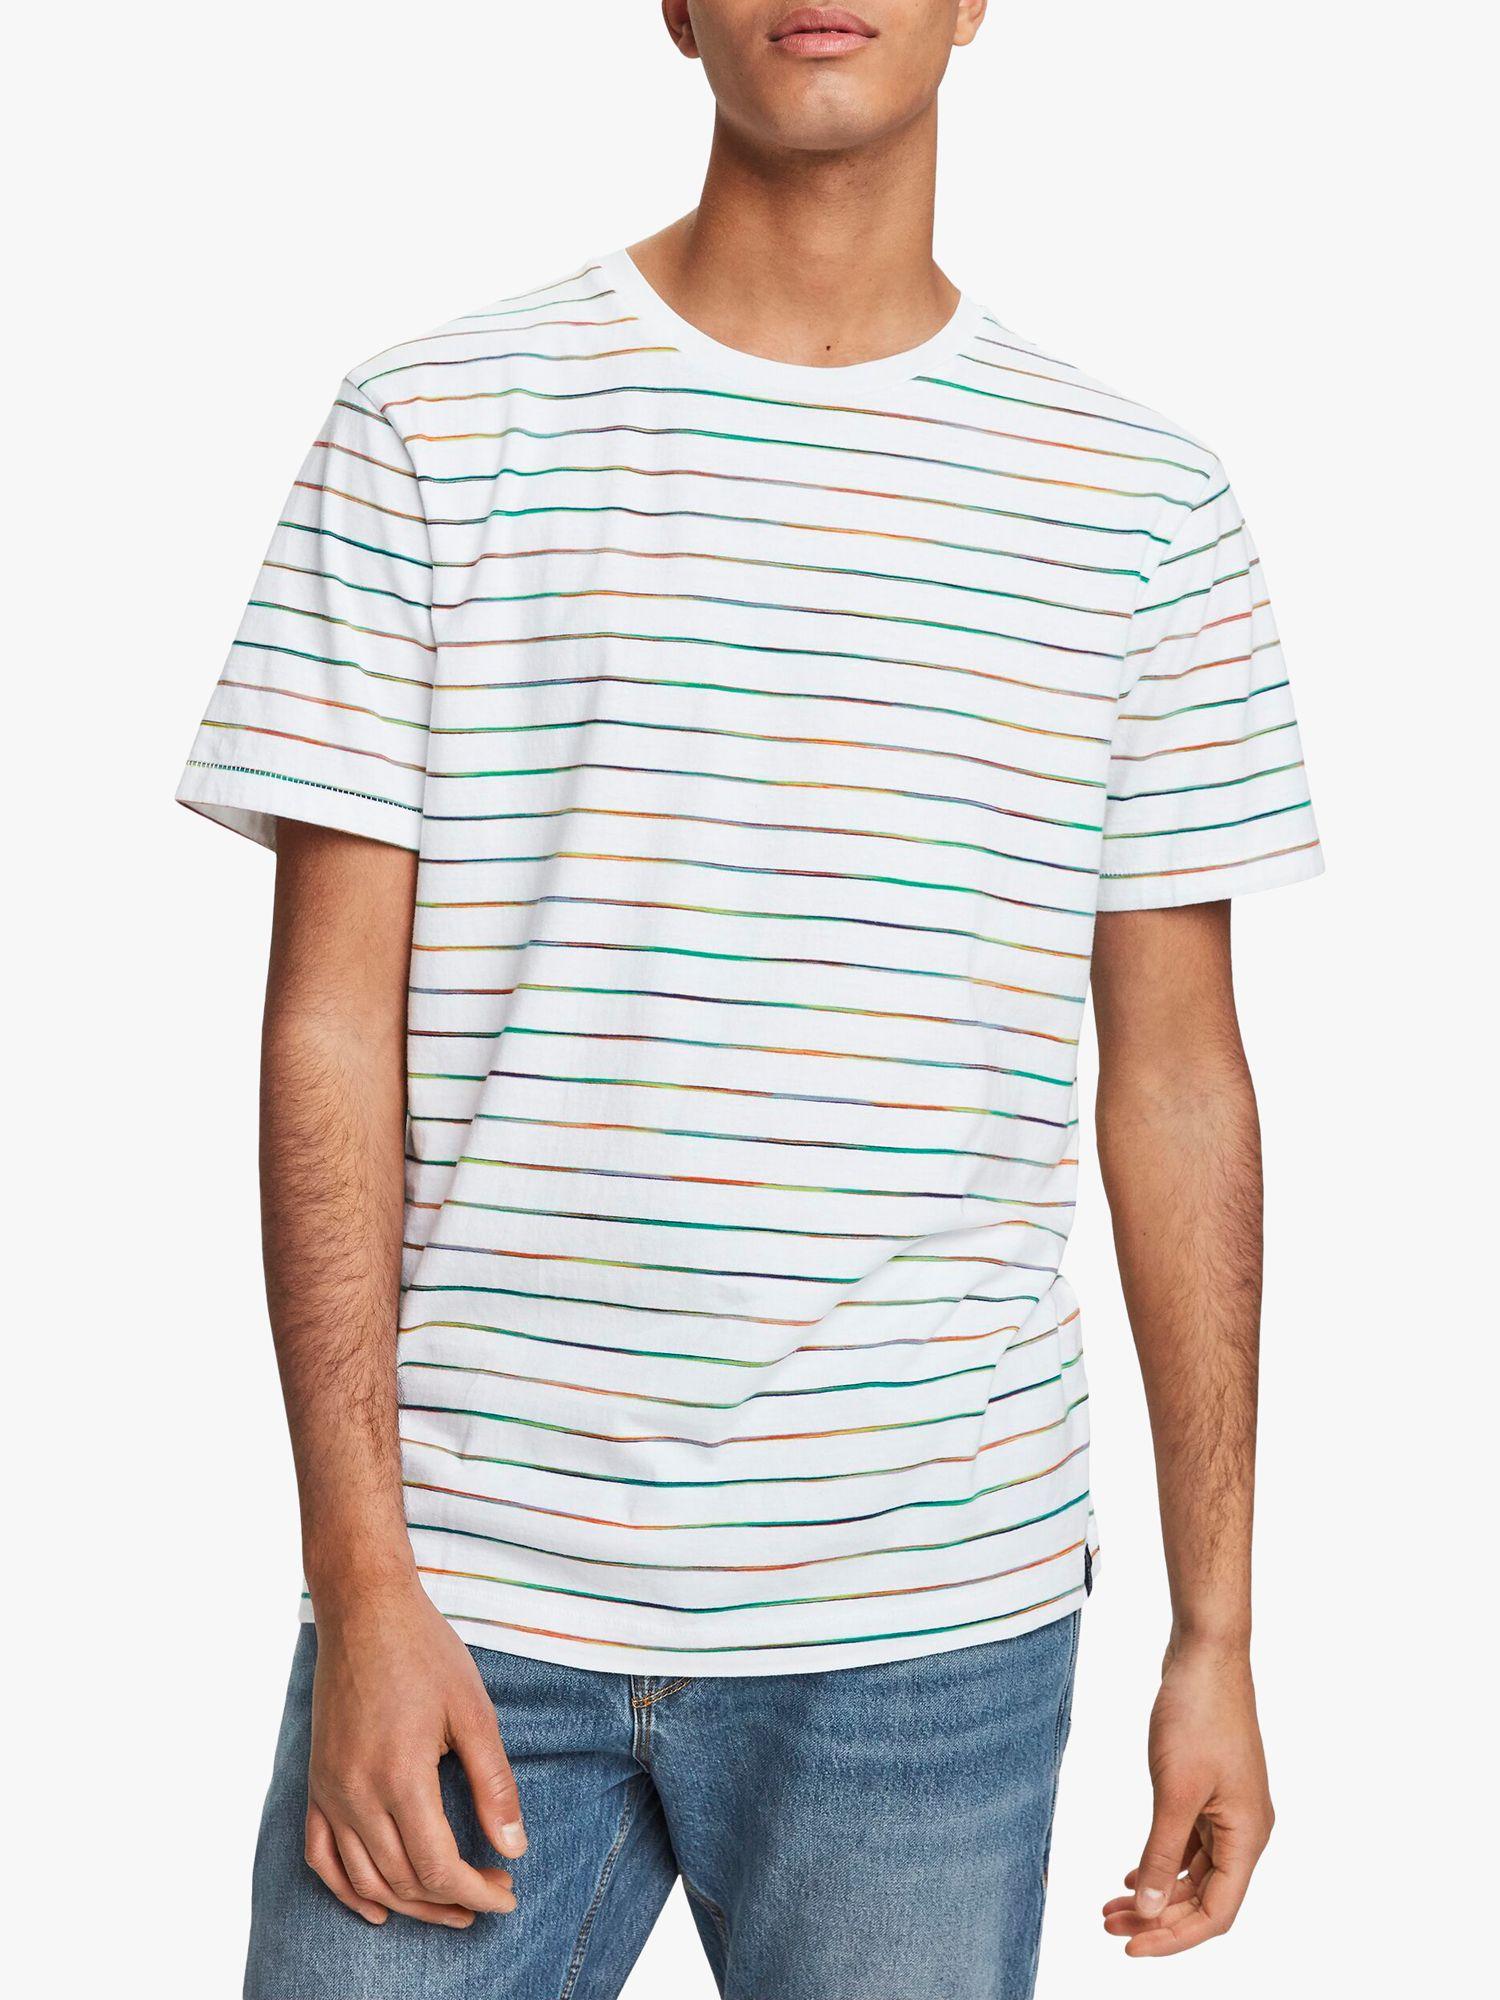 Scotch & Soda Scotch & Soda Stripe T-Shirt, White/Multi